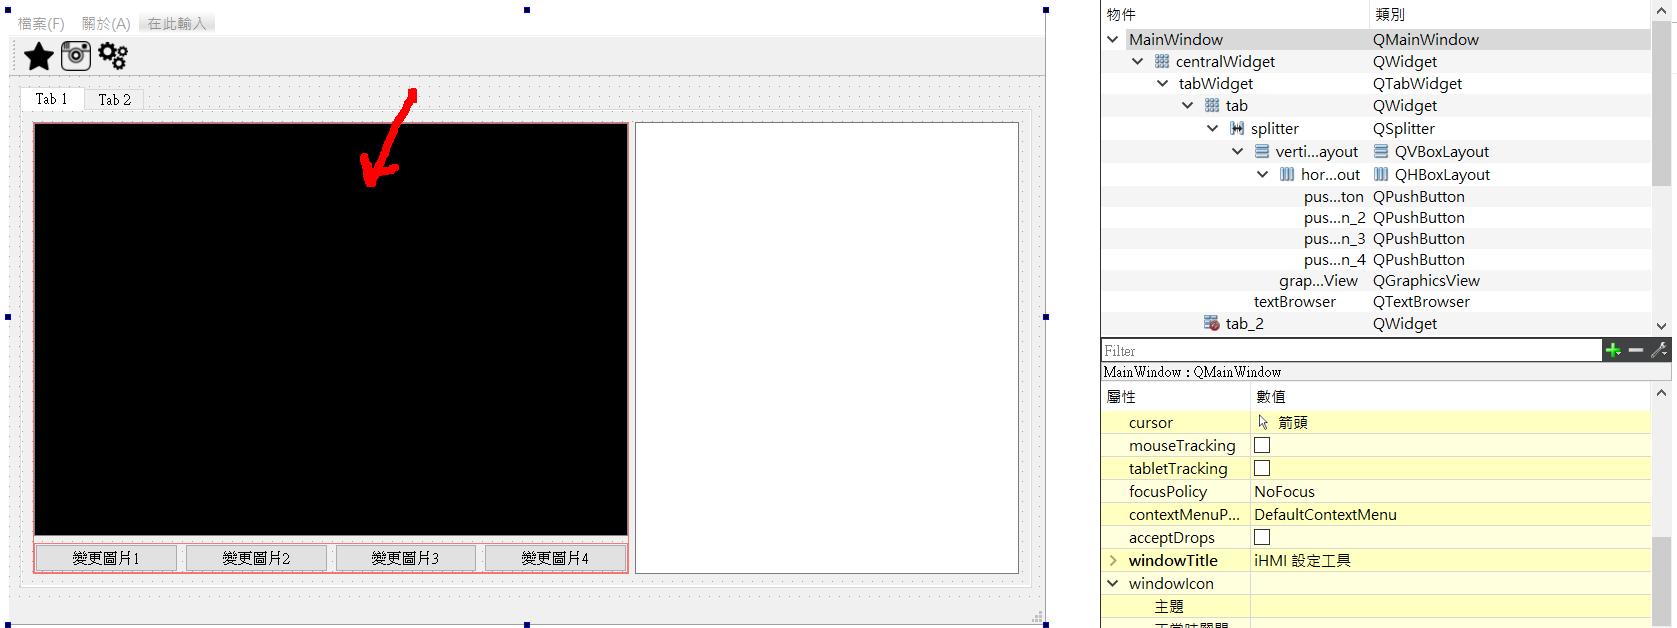 0_1558538615735_91c7d8aa-8bd8-4fcf-917a-a6010164f166-image.png